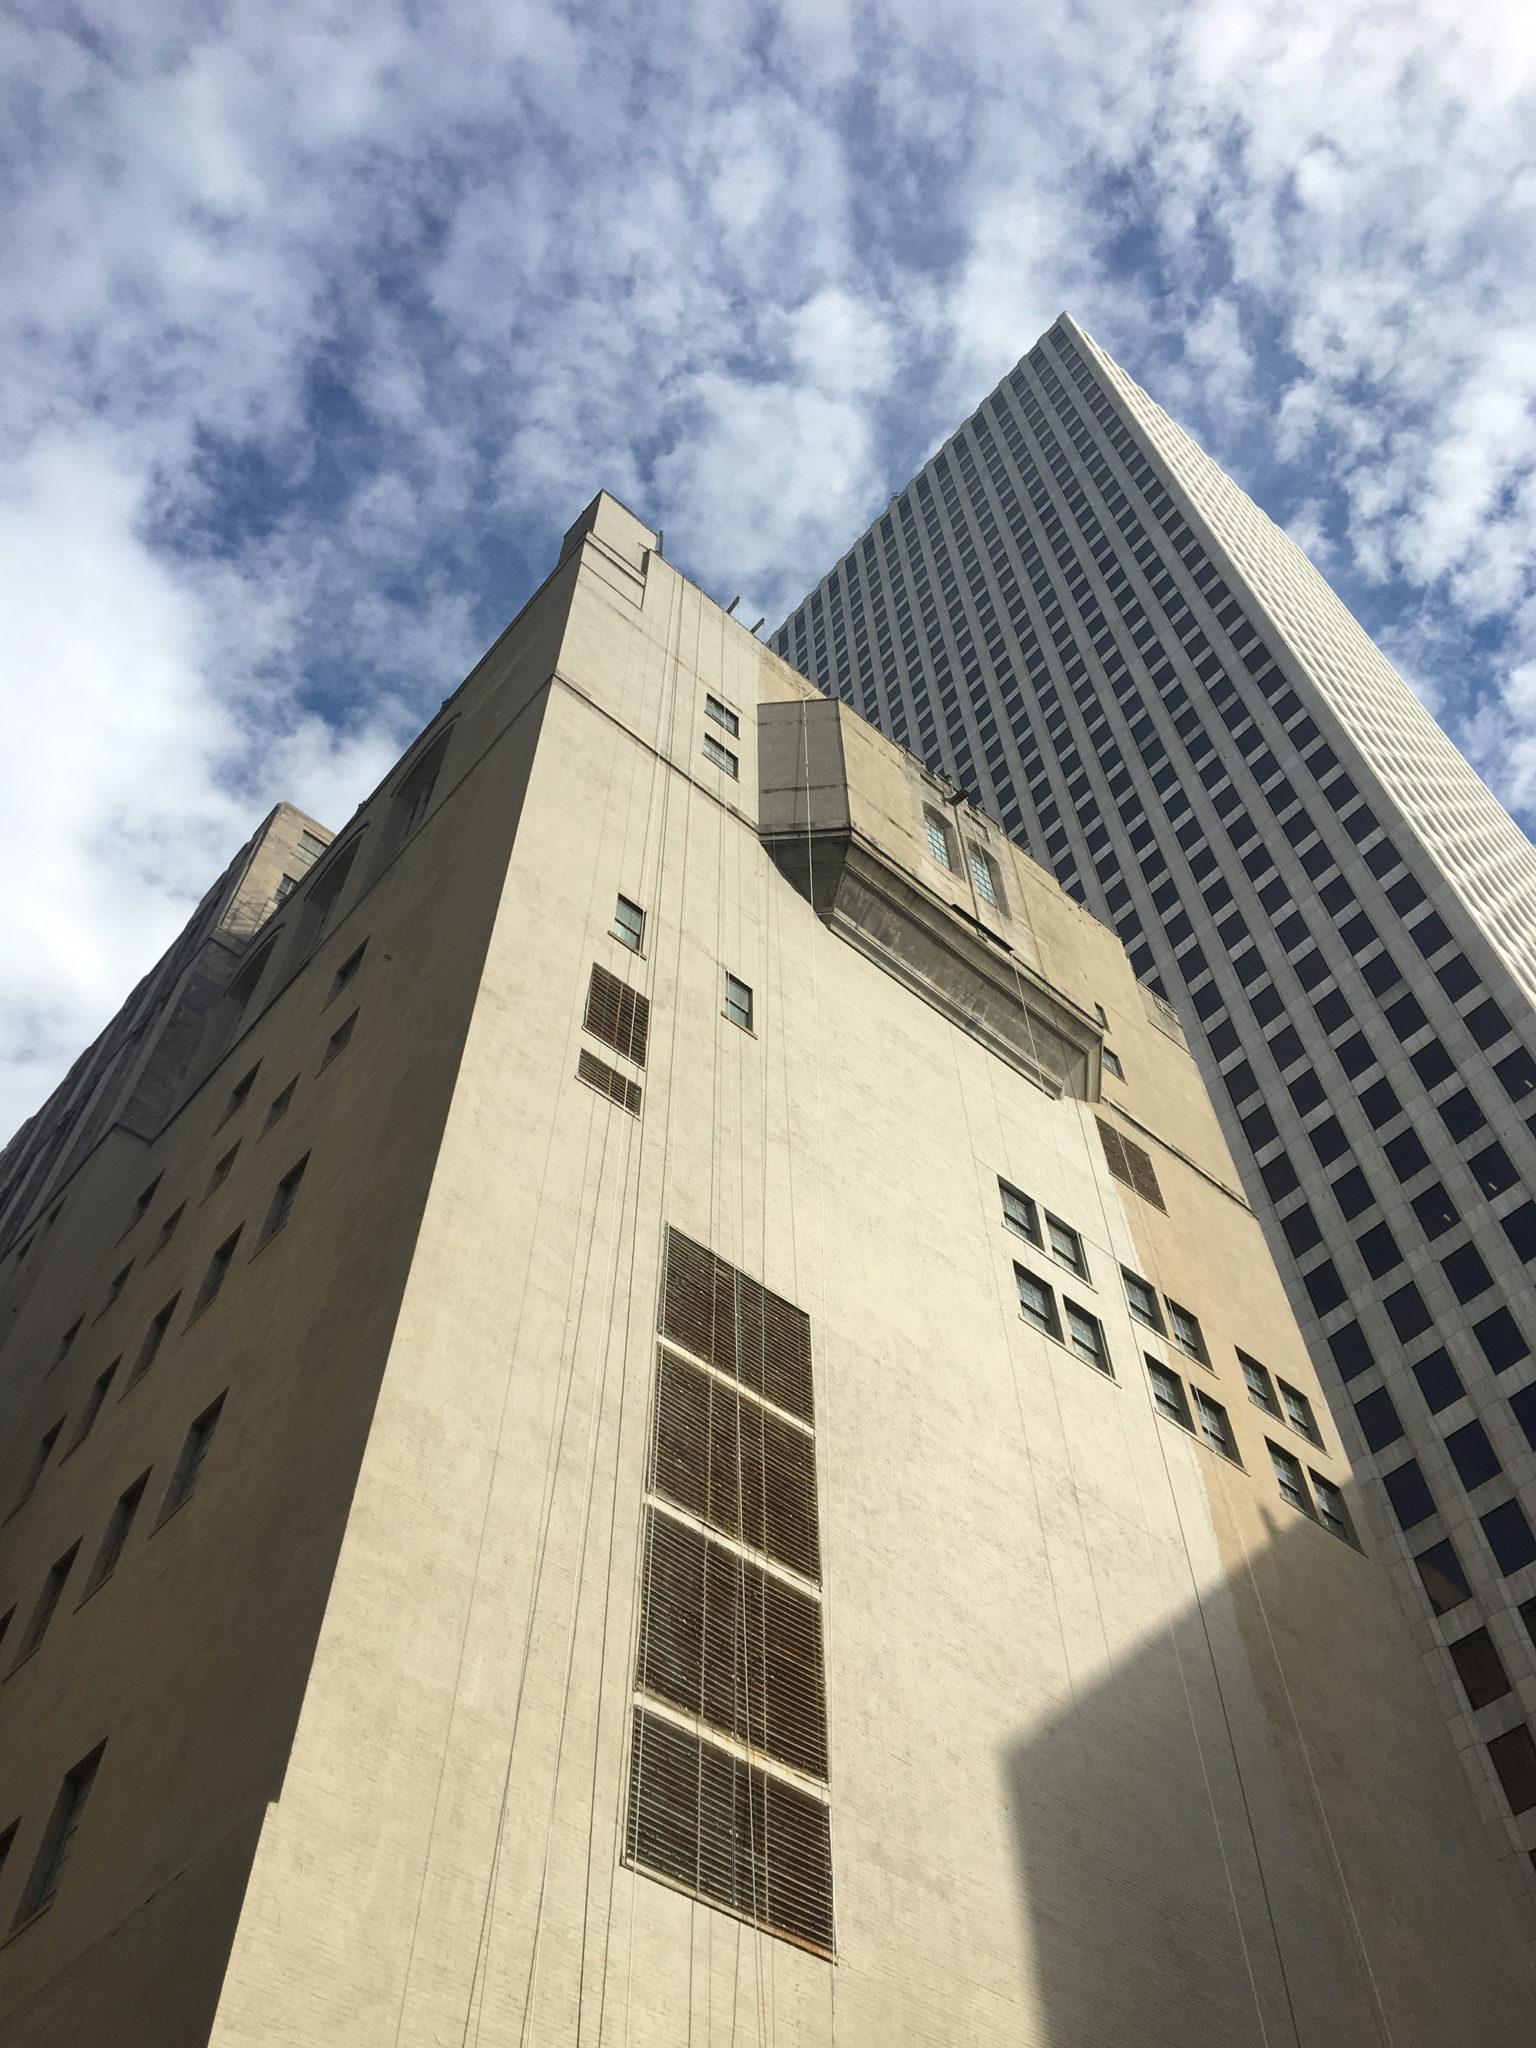 Hilton-hotel-new-orleans-1